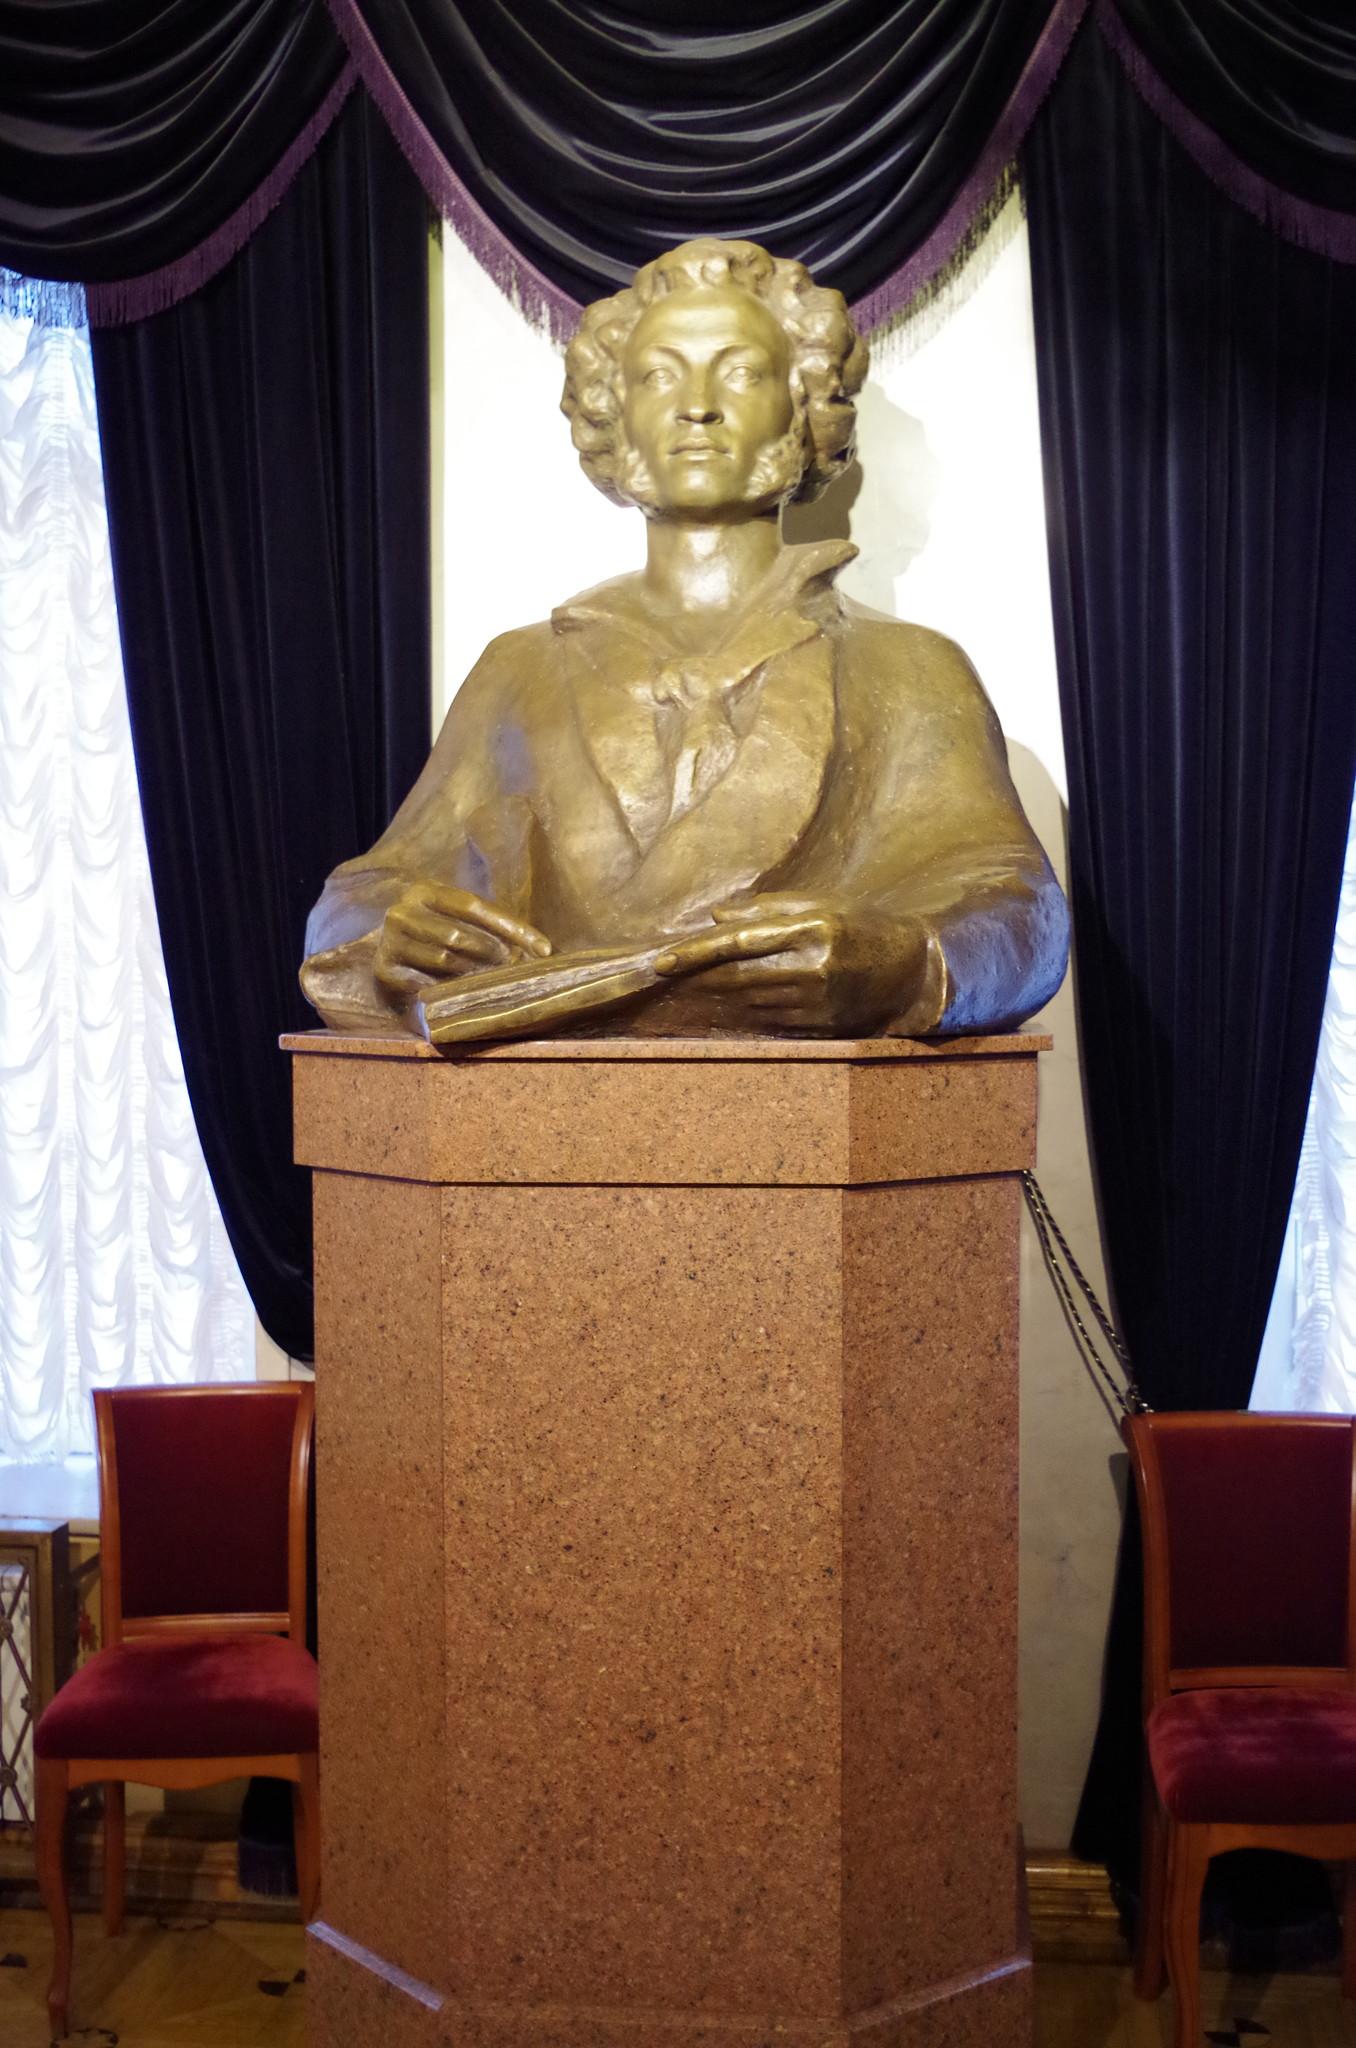 Бюст А.С. Пушкина на втором этаже Московского драматического театра имени А.С. Пушкина